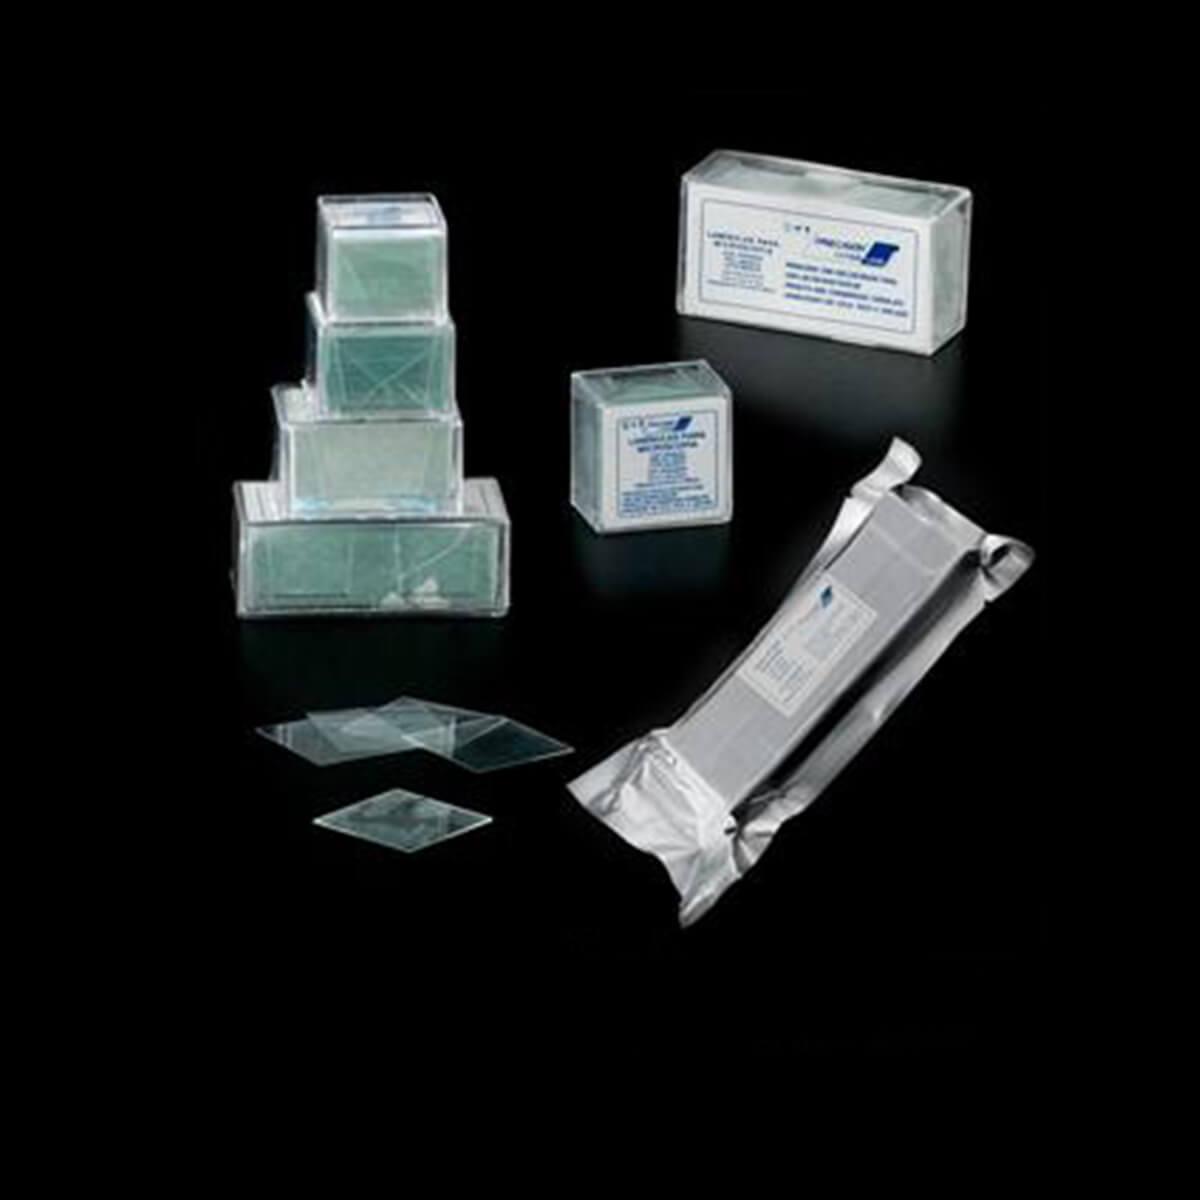 Lamínulas para Microscópio Caixa com 100 Unidades